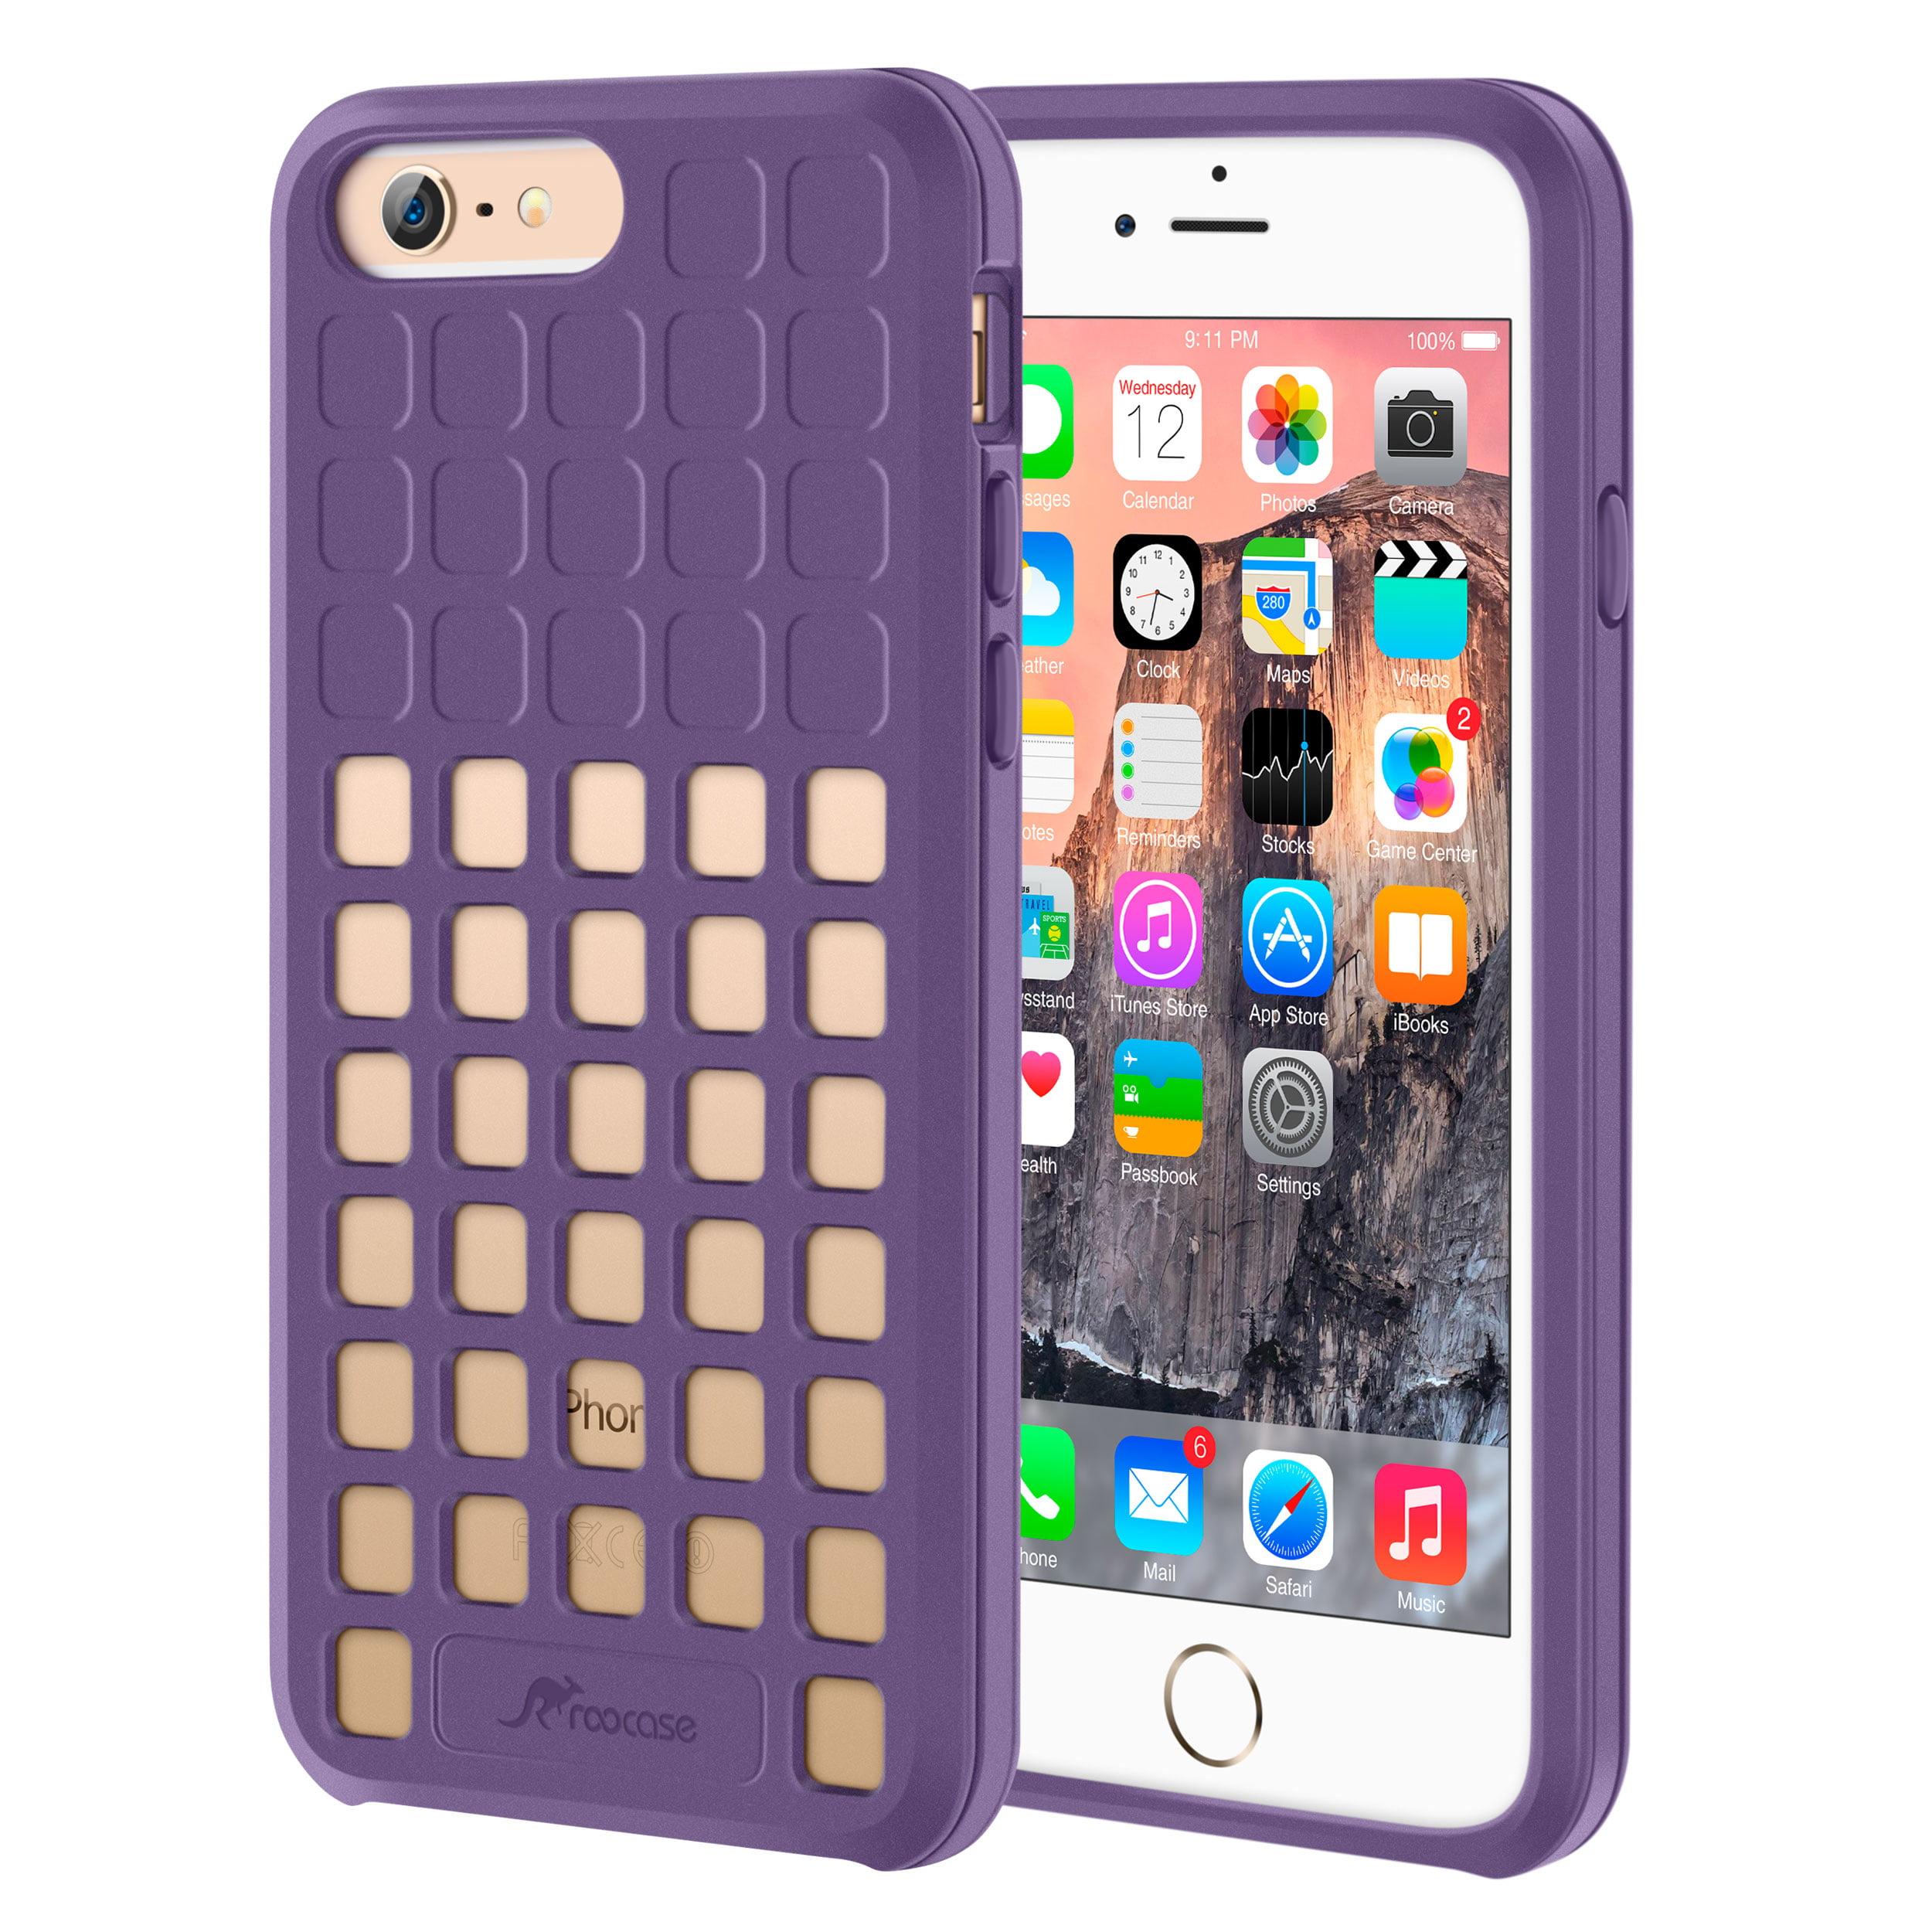 iPhone 6s Case, roocase [Shock Resistant] iPhone 6 Slim Lightweight [Quadric Series] Case Cover for Apple iPhone 6 / 6s (2015)